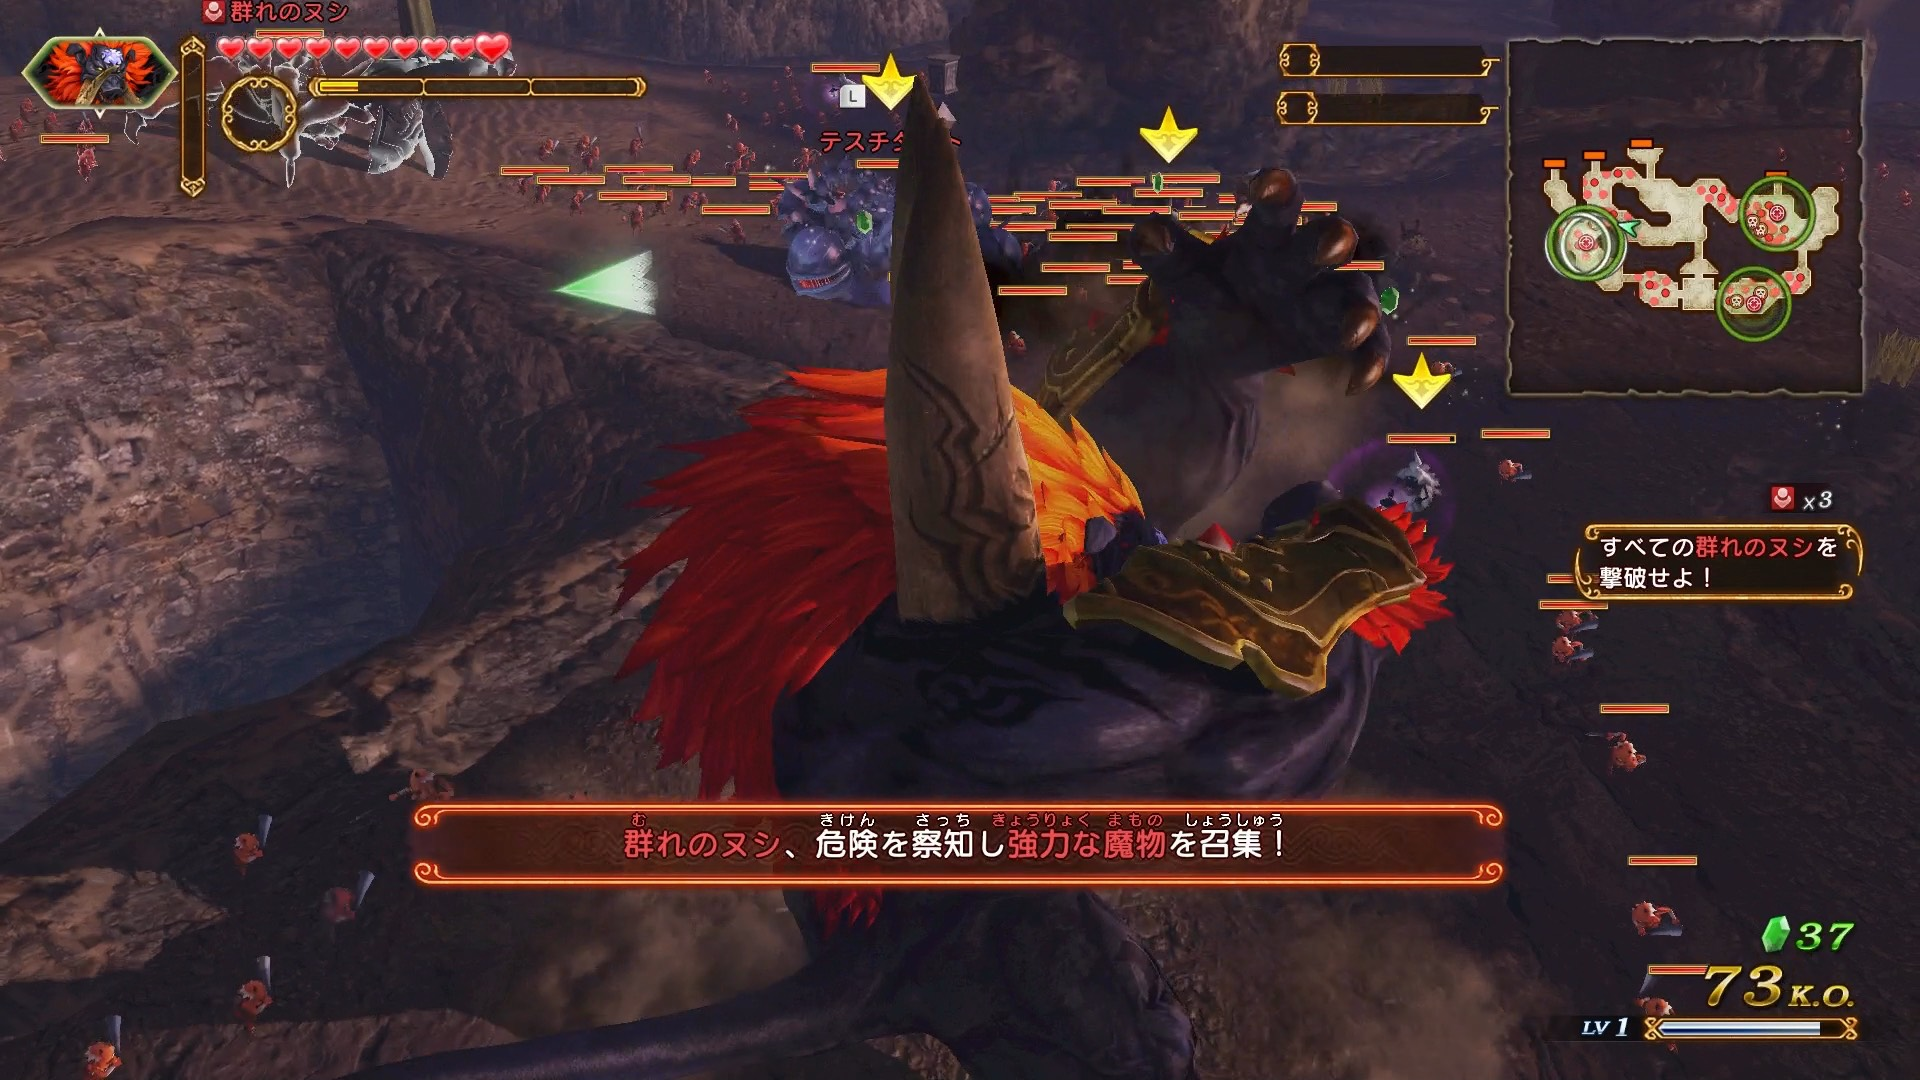 Hyrule Warriors Definitive Edition Screenshots Rpgfan